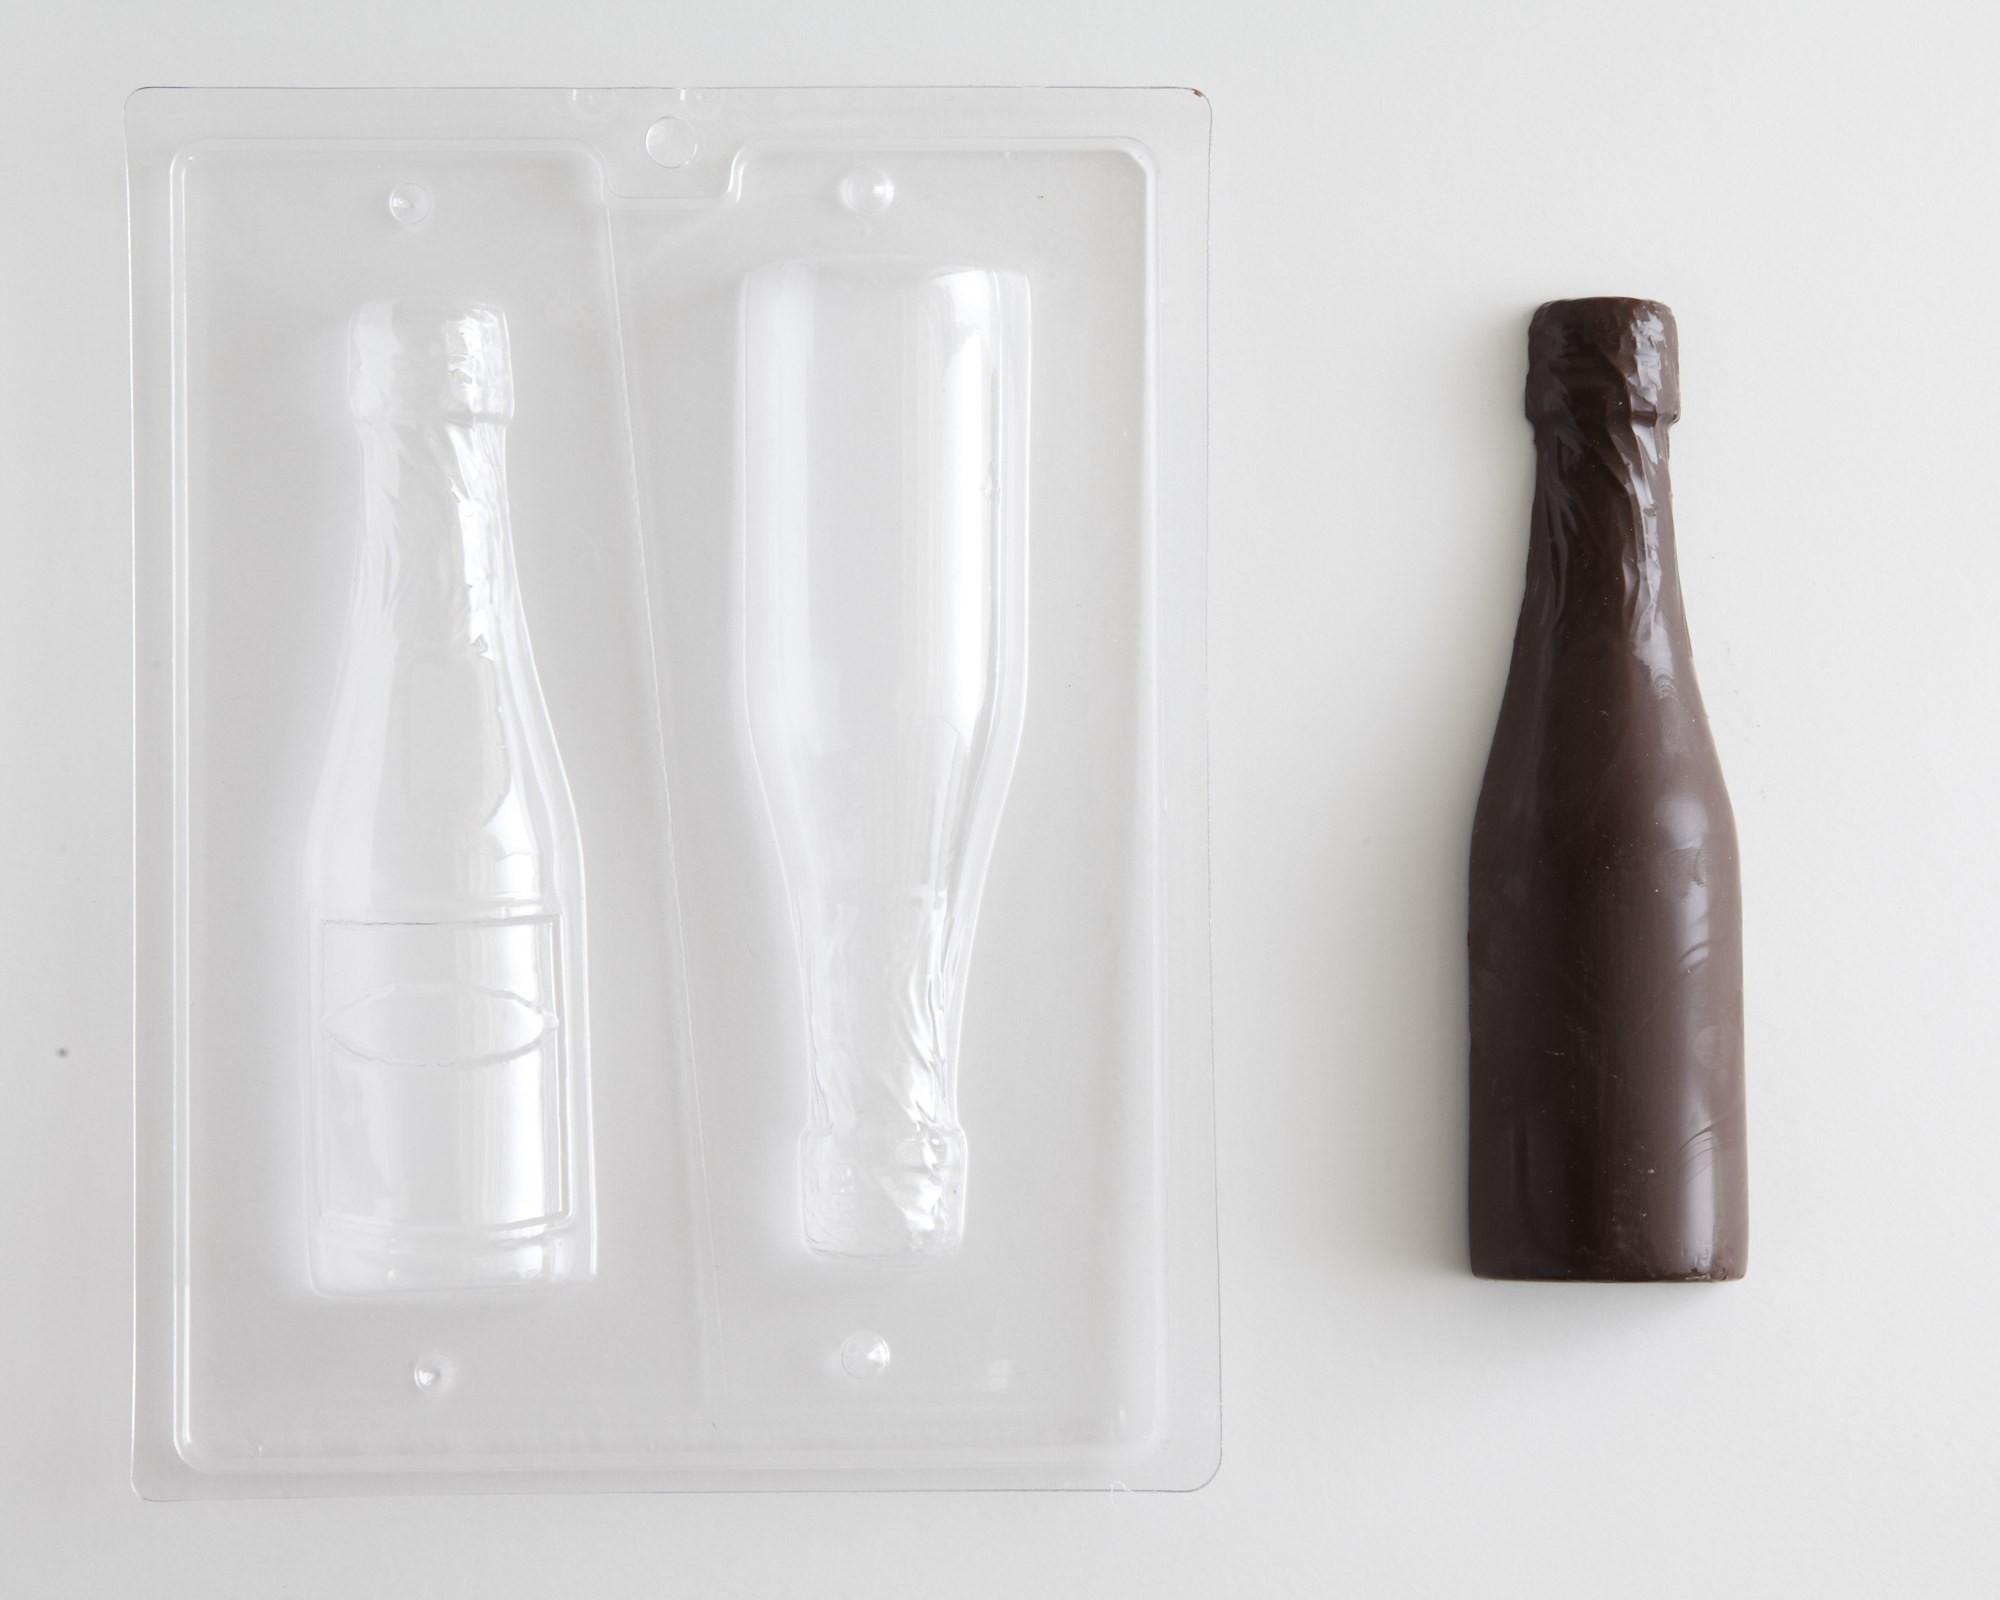 Champagne Bottle - Small Chocolate Mold Cakegirls